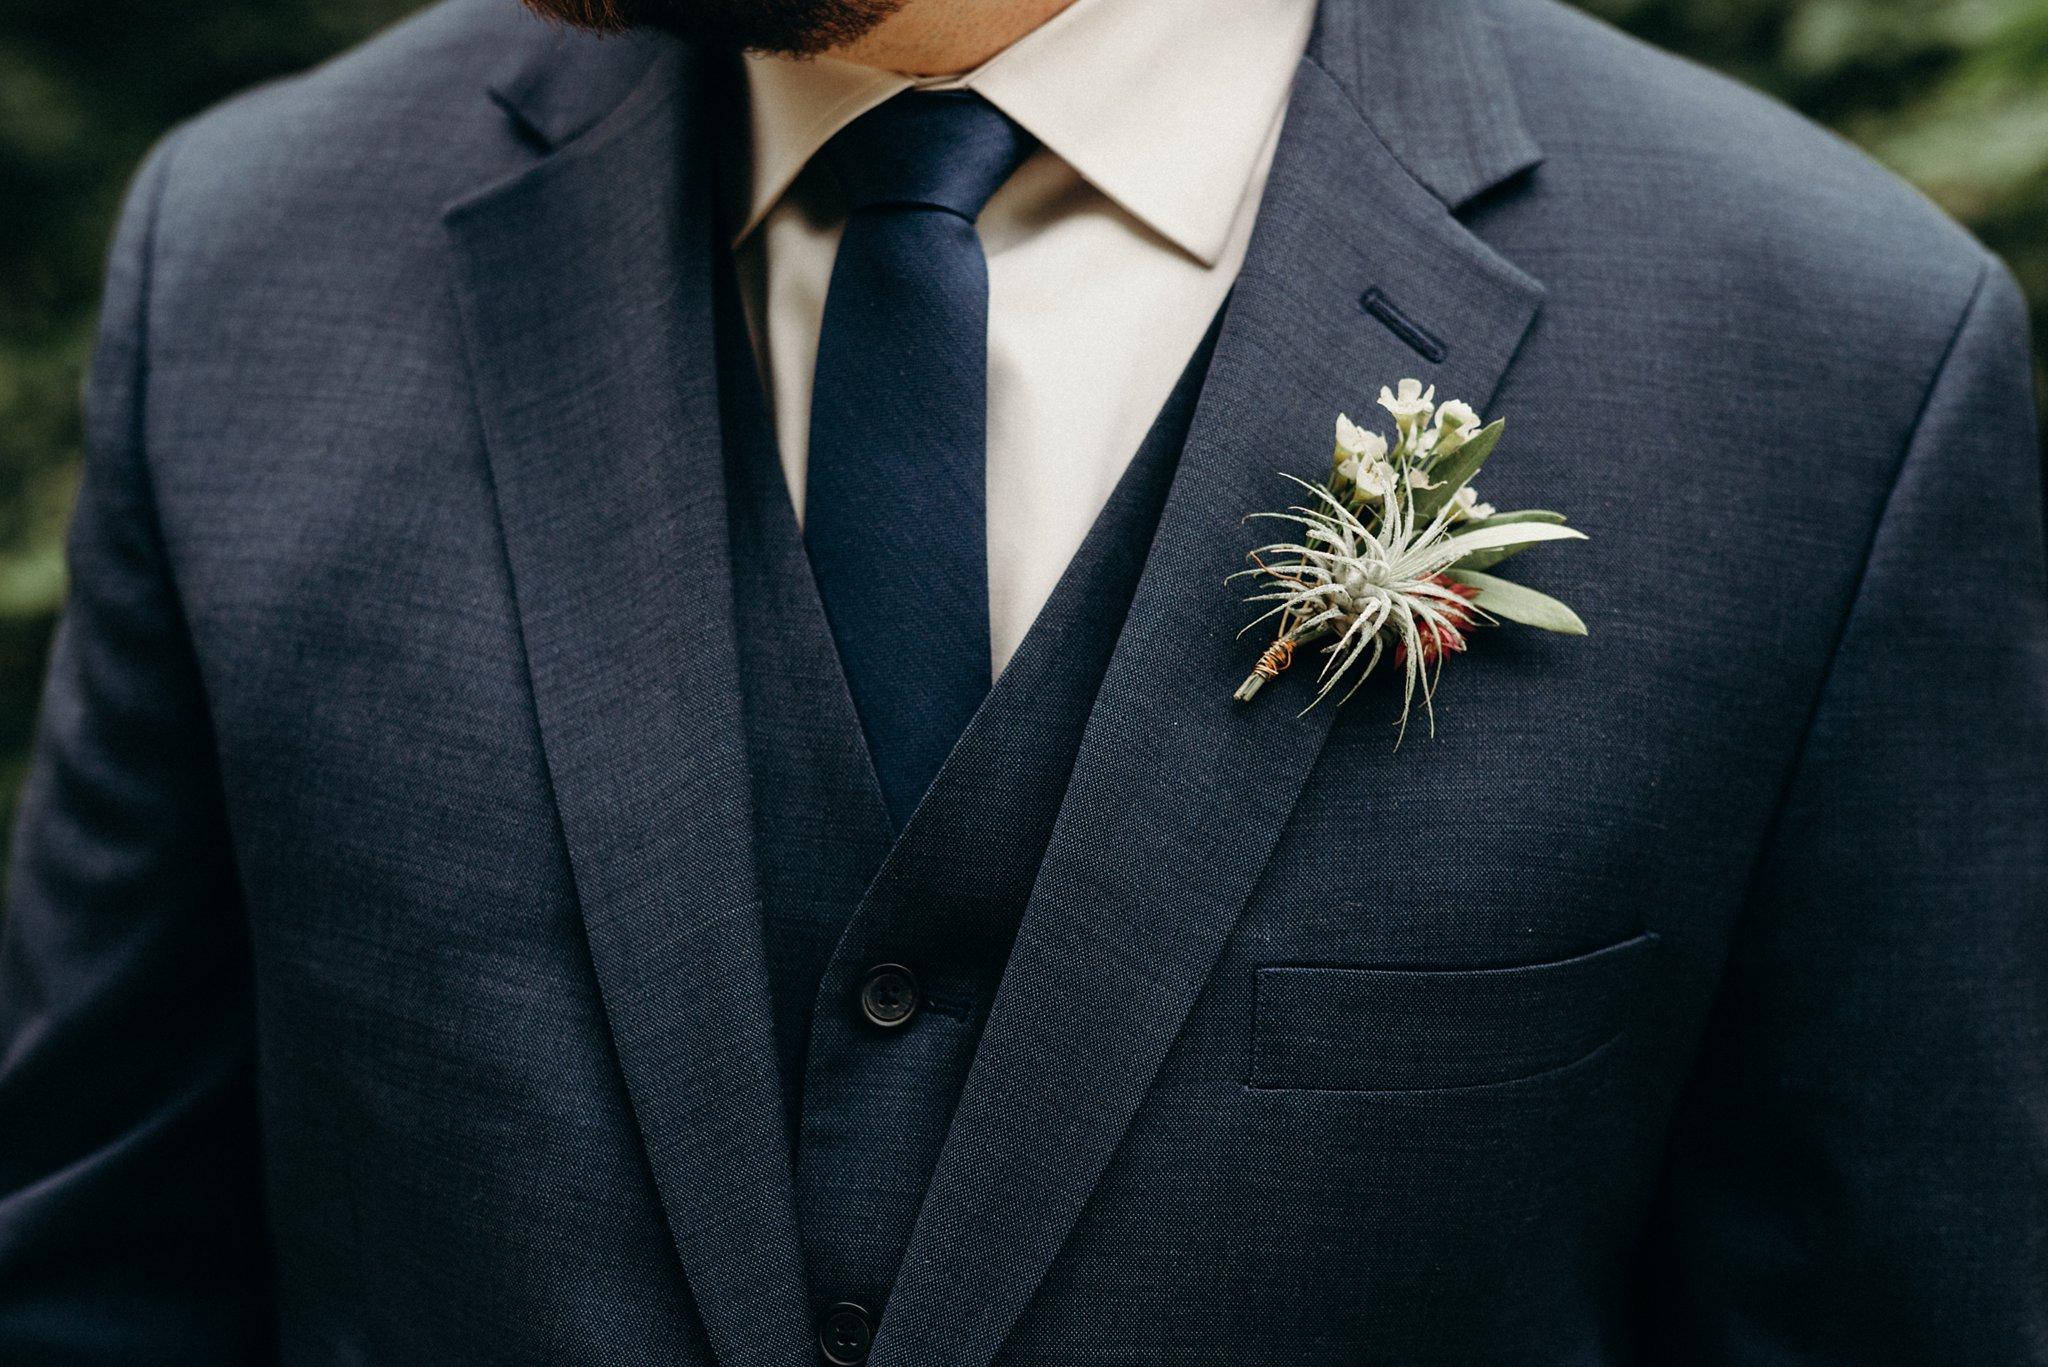 kaihla_tonai_intimate_wedding_elopement_photographer_6599.jpg